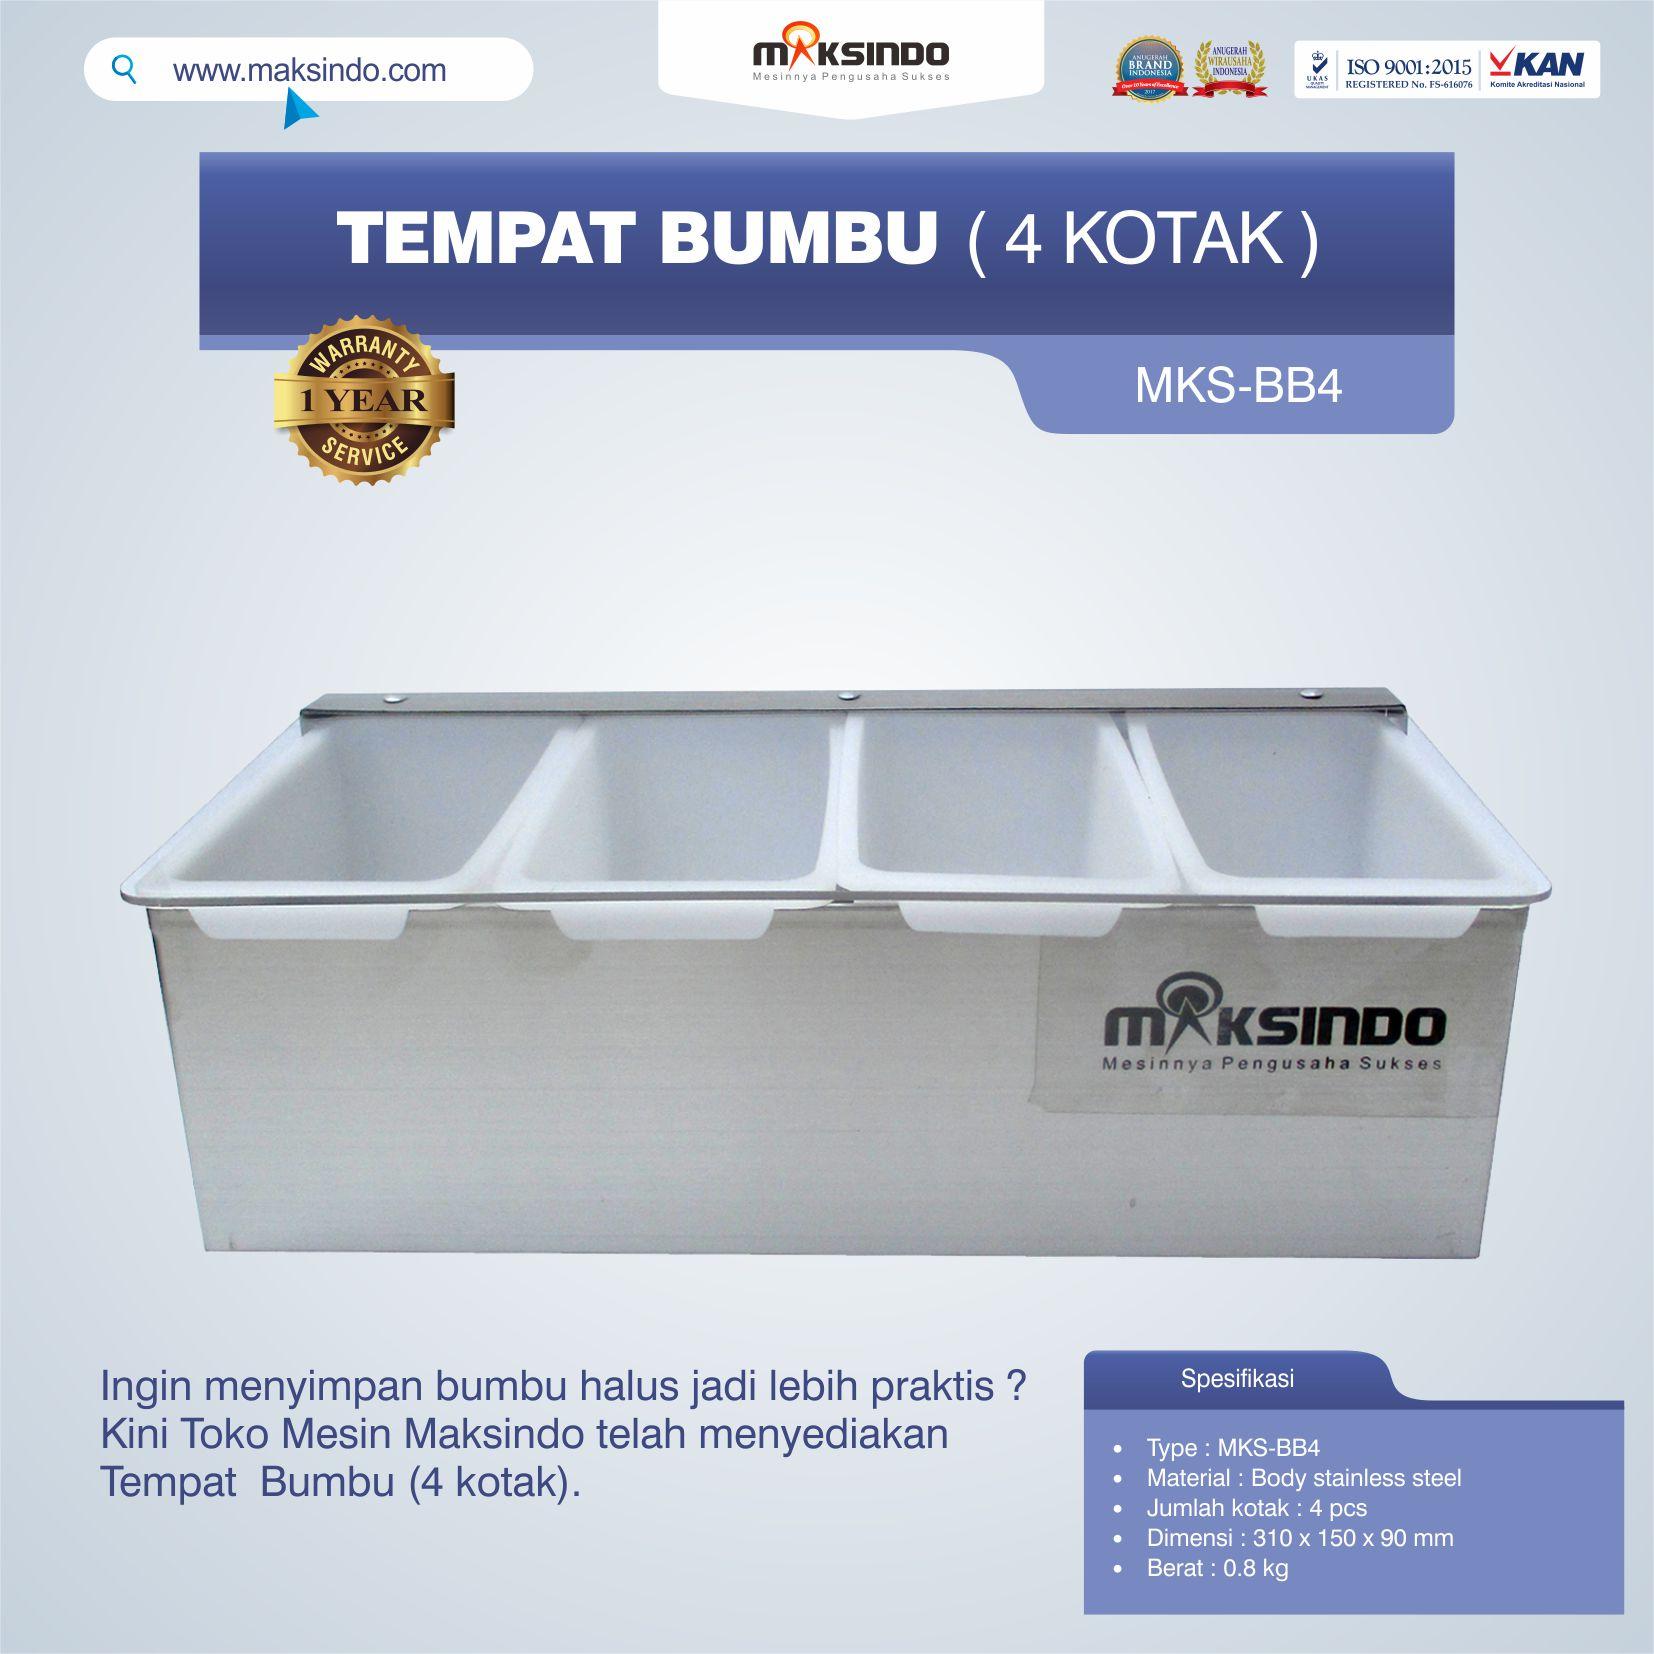 Jual Tempat Bumbu (4 kotak) di Bandung